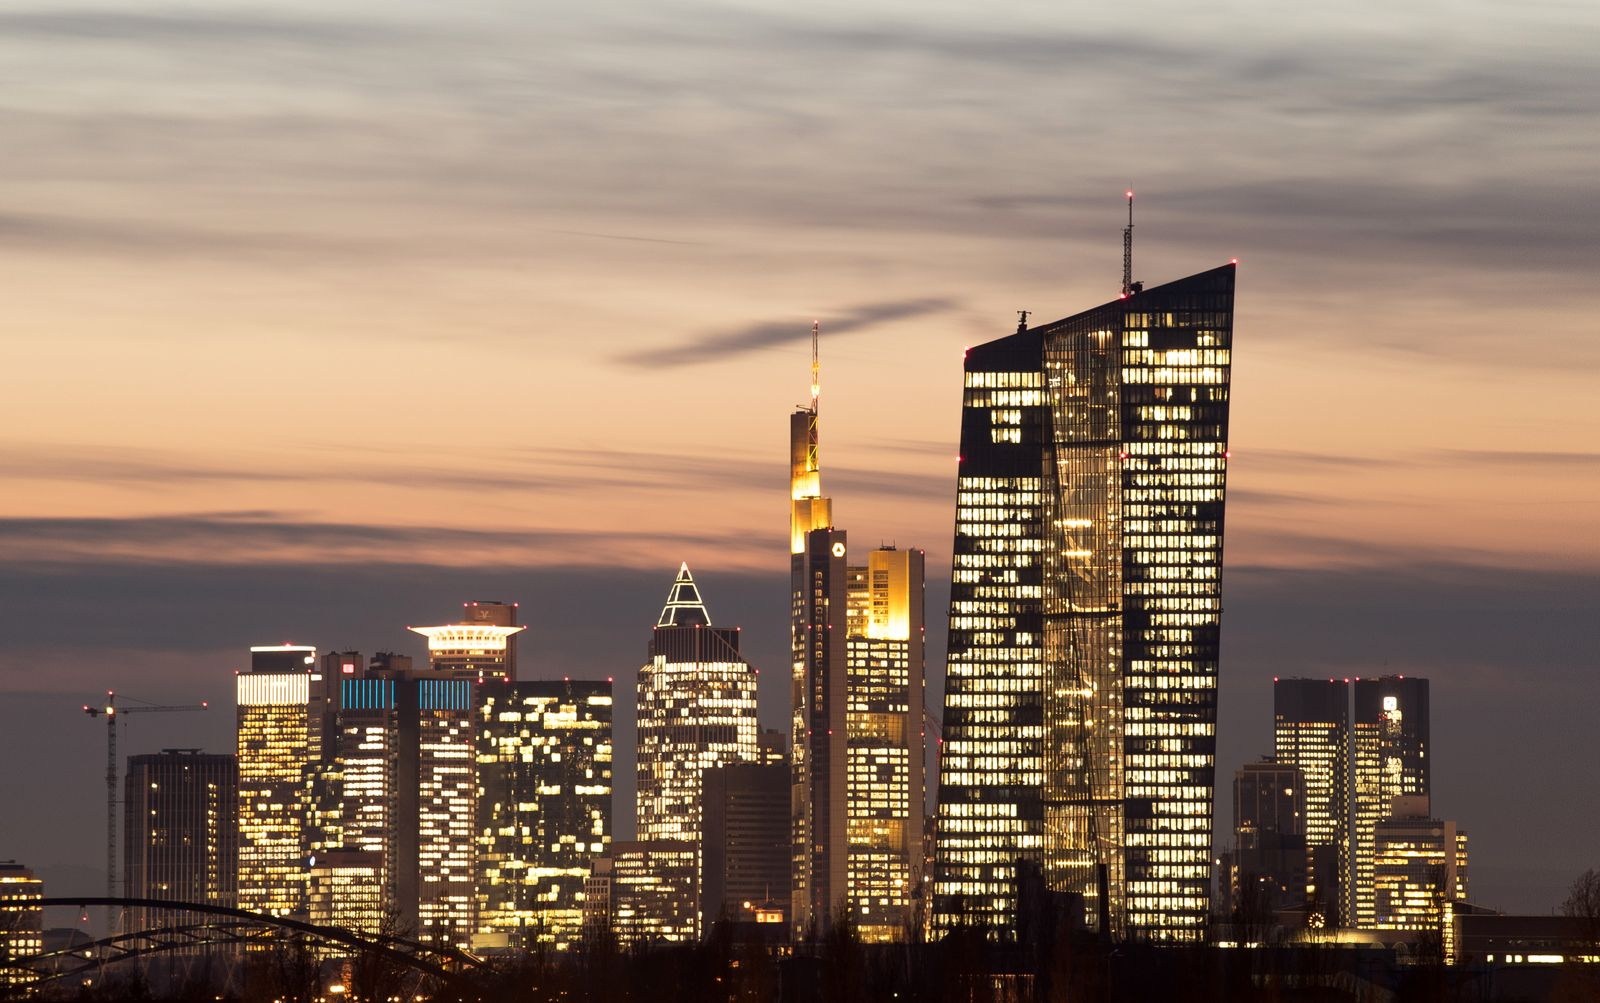 EZB / Frankfurt Skyline